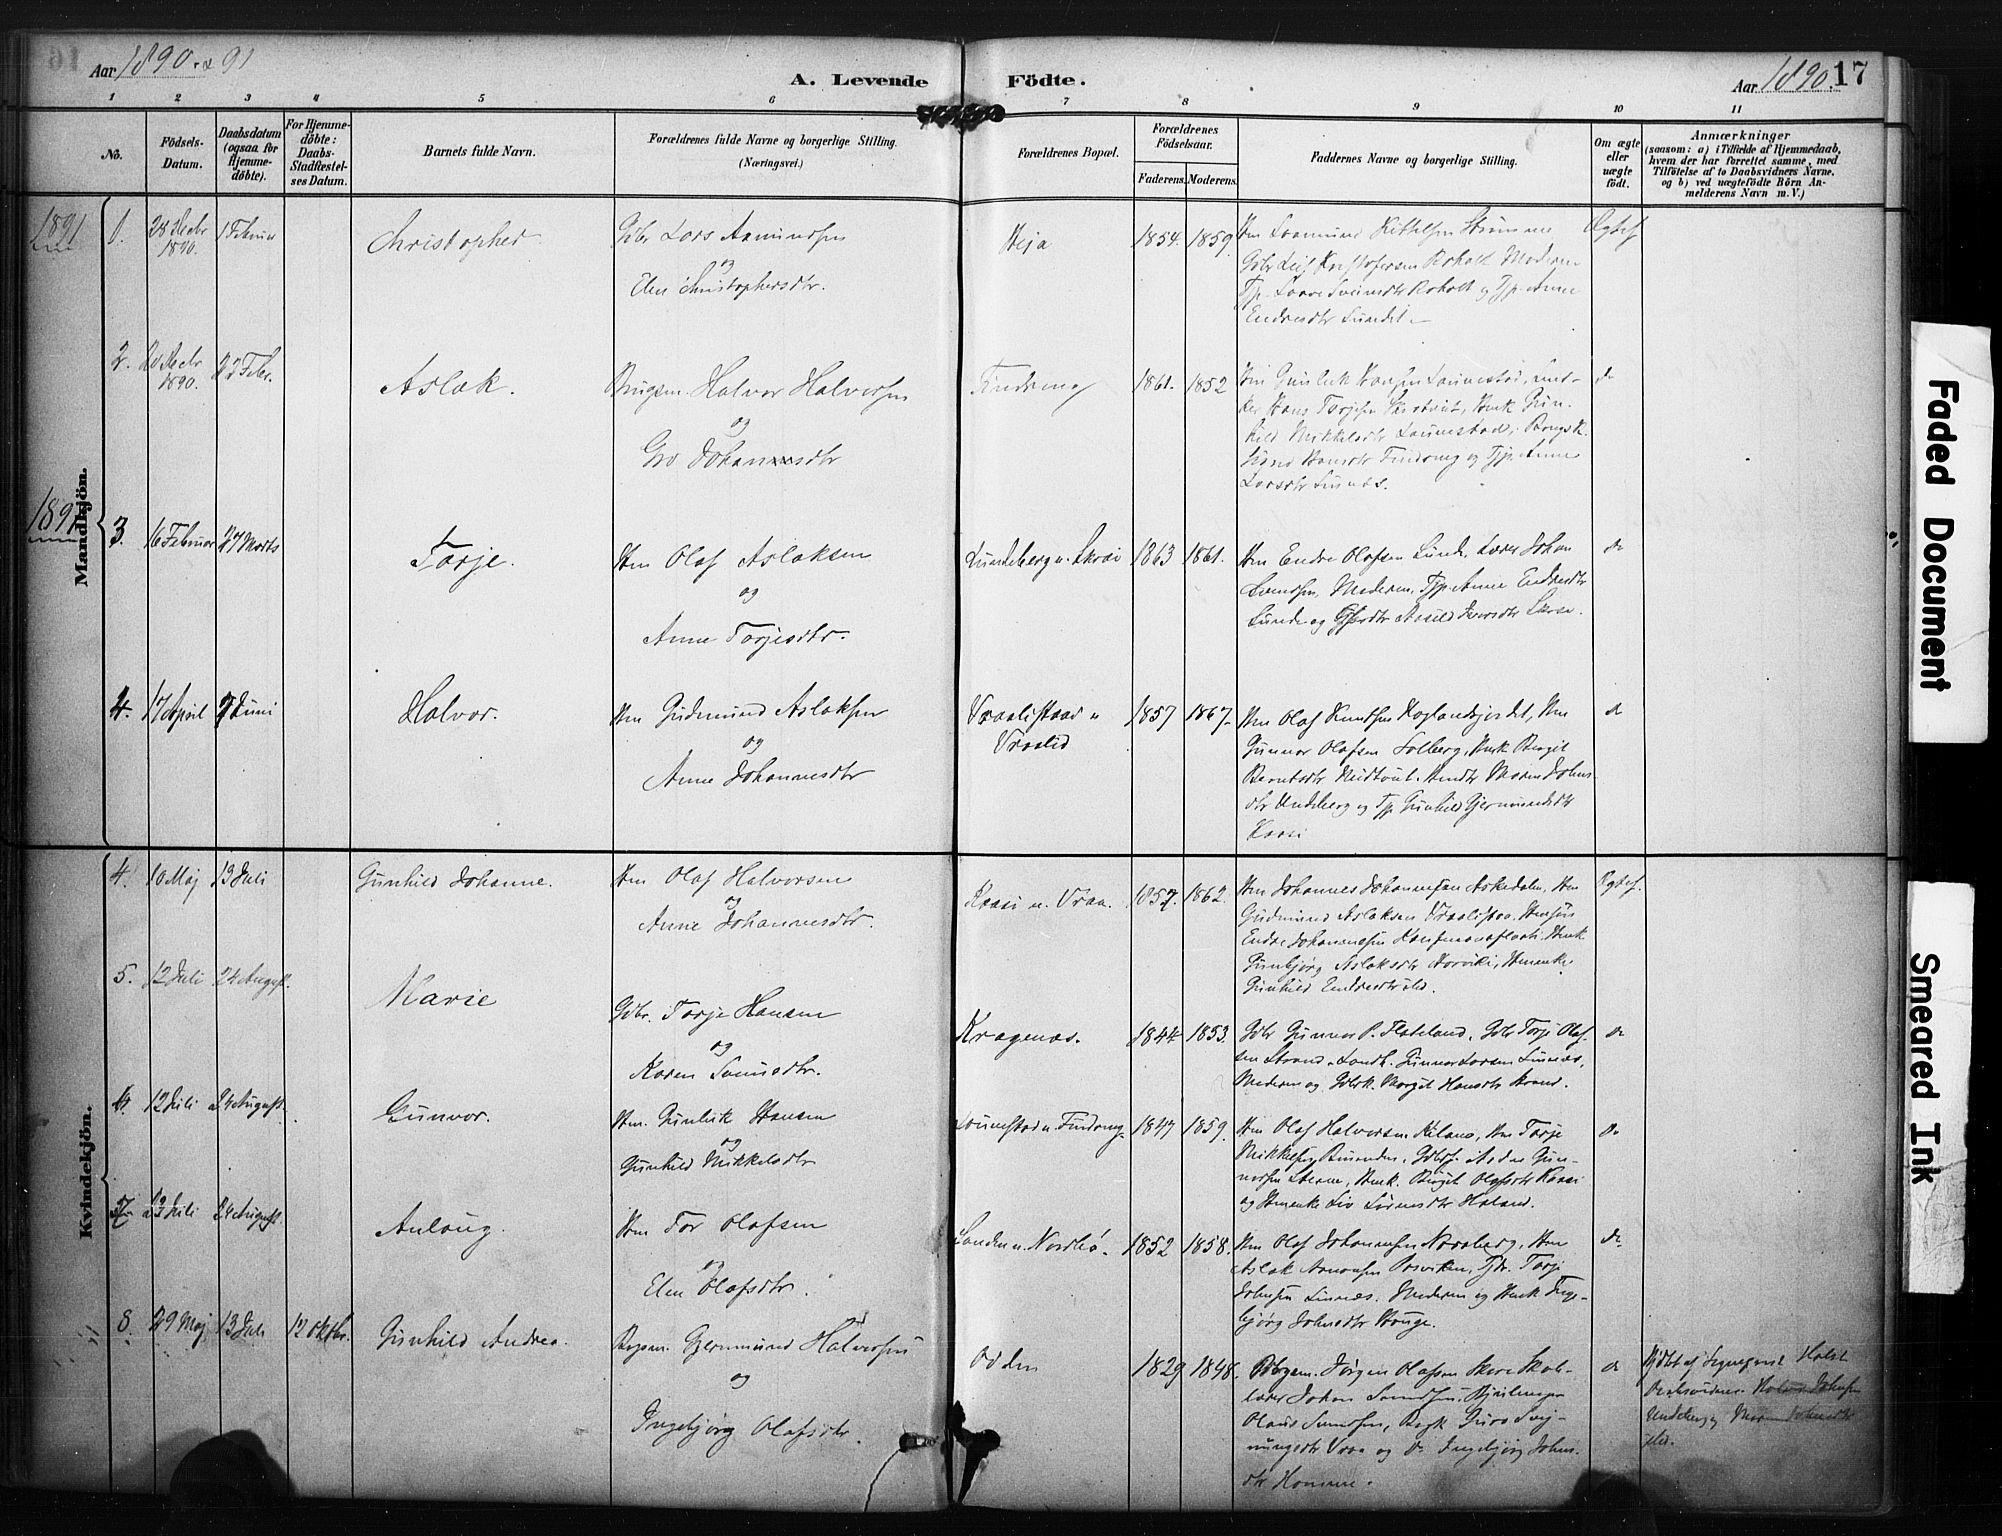 SAKO, Kviteseid kirkebøker, F/Fc/L0002: Ministerialbok nr. III 2, 1882-1908, s. 17